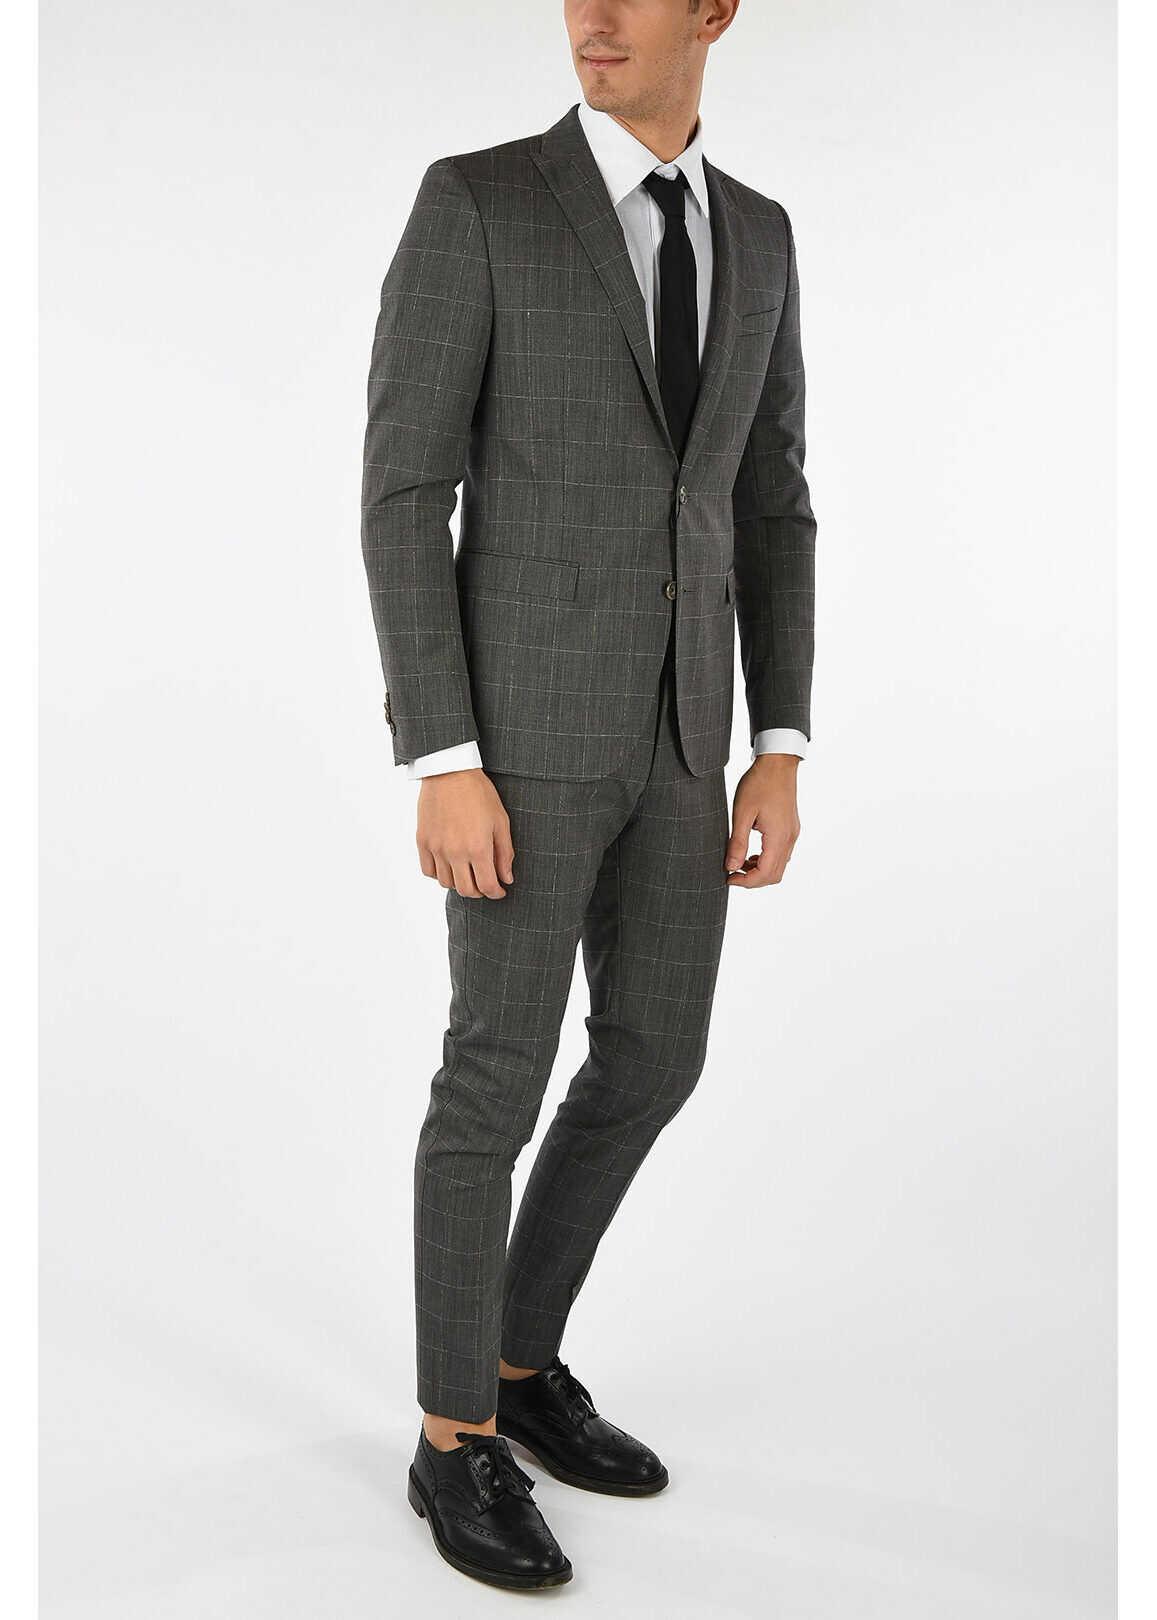 CORNELIANI CC COLLECTION check RESET virgin wool drop 8 r 2-button suit GRAY imagine